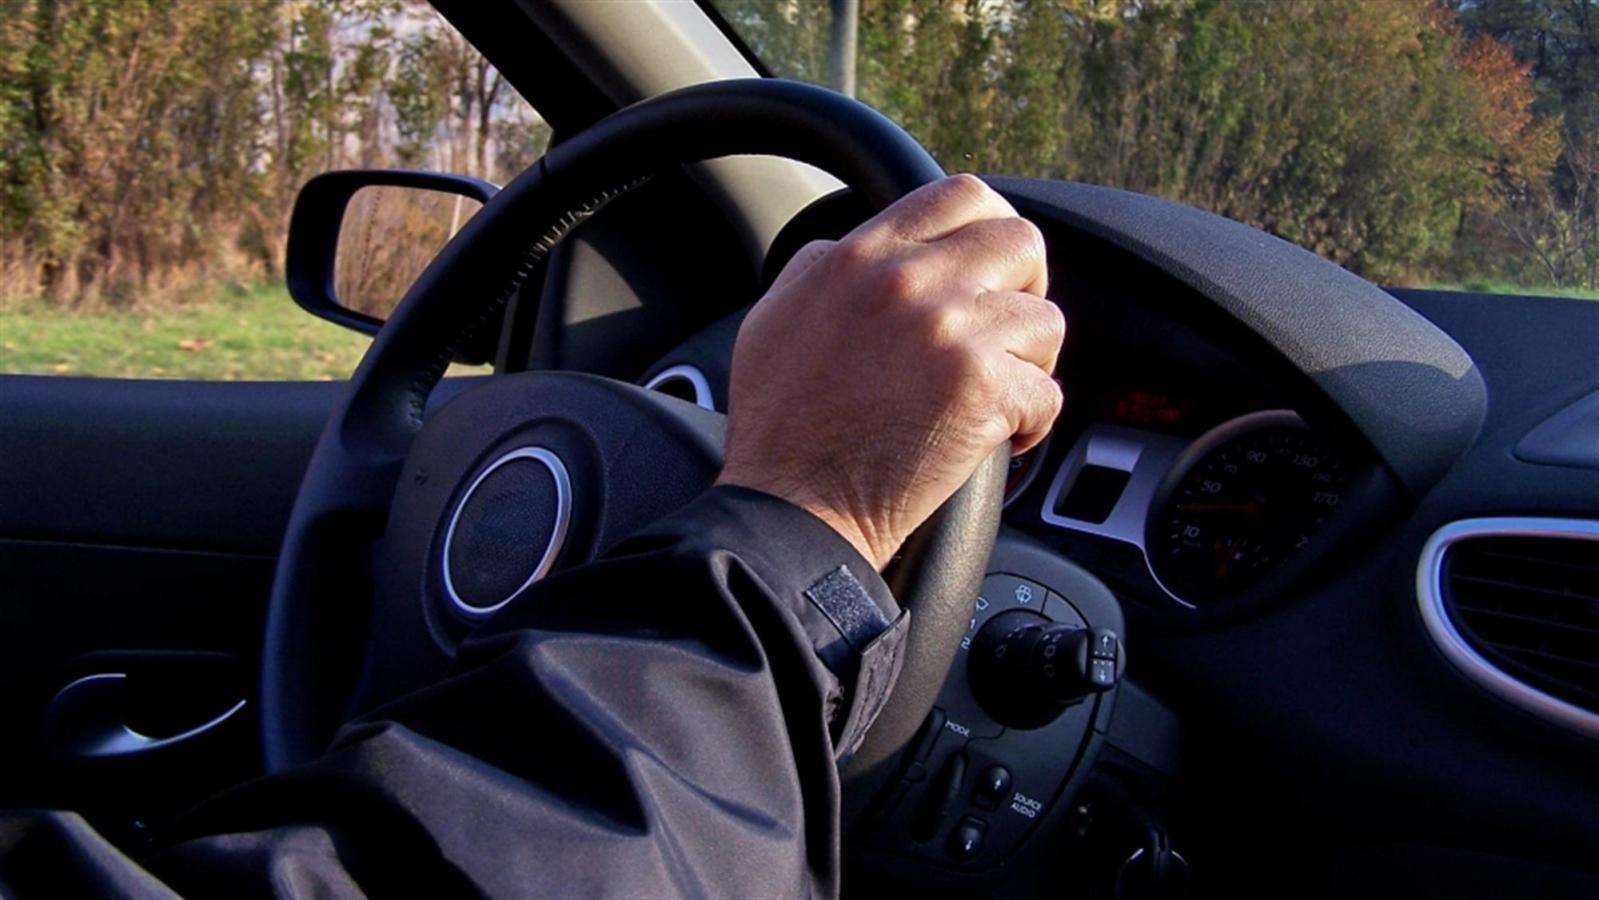 voznja-automobil-volan-vozac.jpg